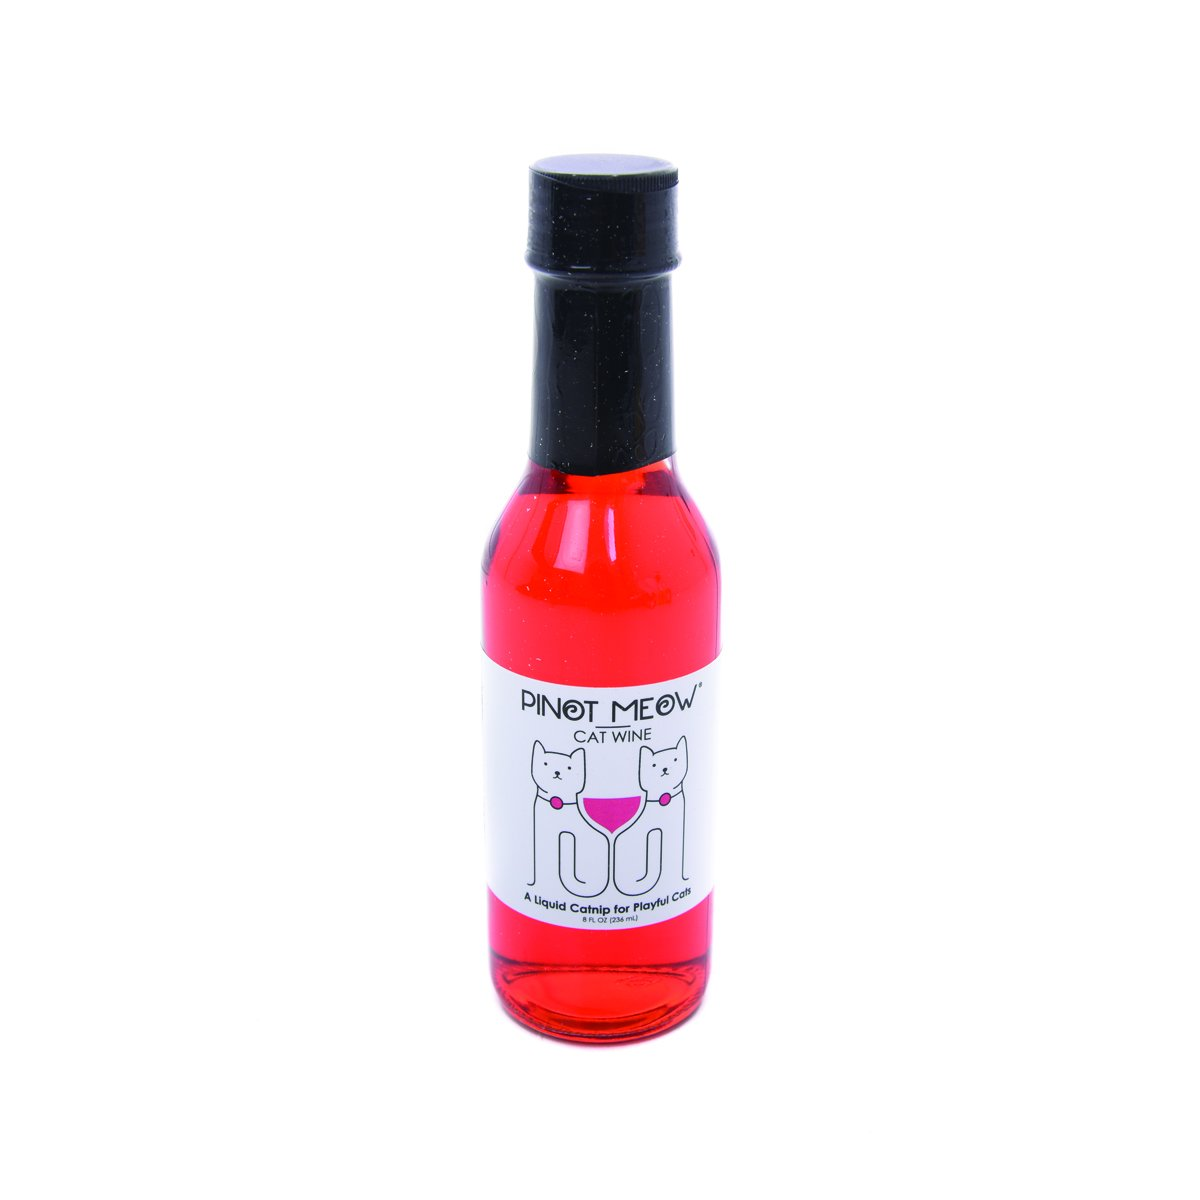 Apollo Peak Pinot Meow Cat Wine Gift Glass Bottle 5 Meownces